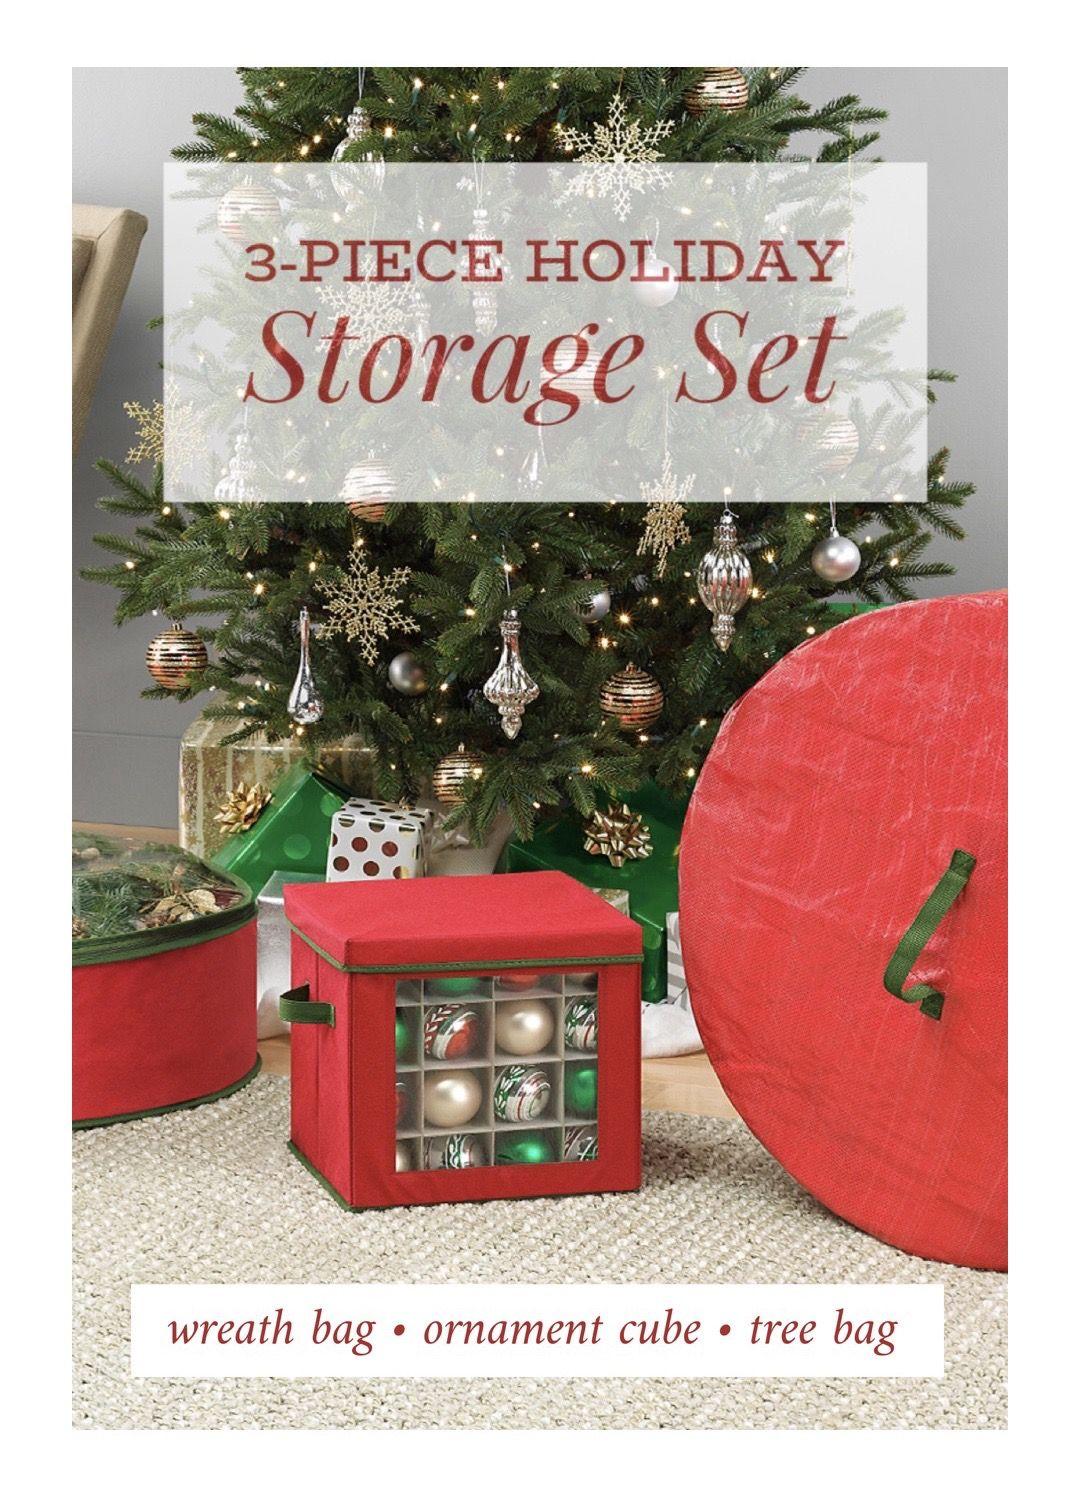 3 Piece Holiday Storage Kit Includes Tree Bag Wreath Bag Ornament Box Ornament Storage Box Holiday Storage Ornament Storage